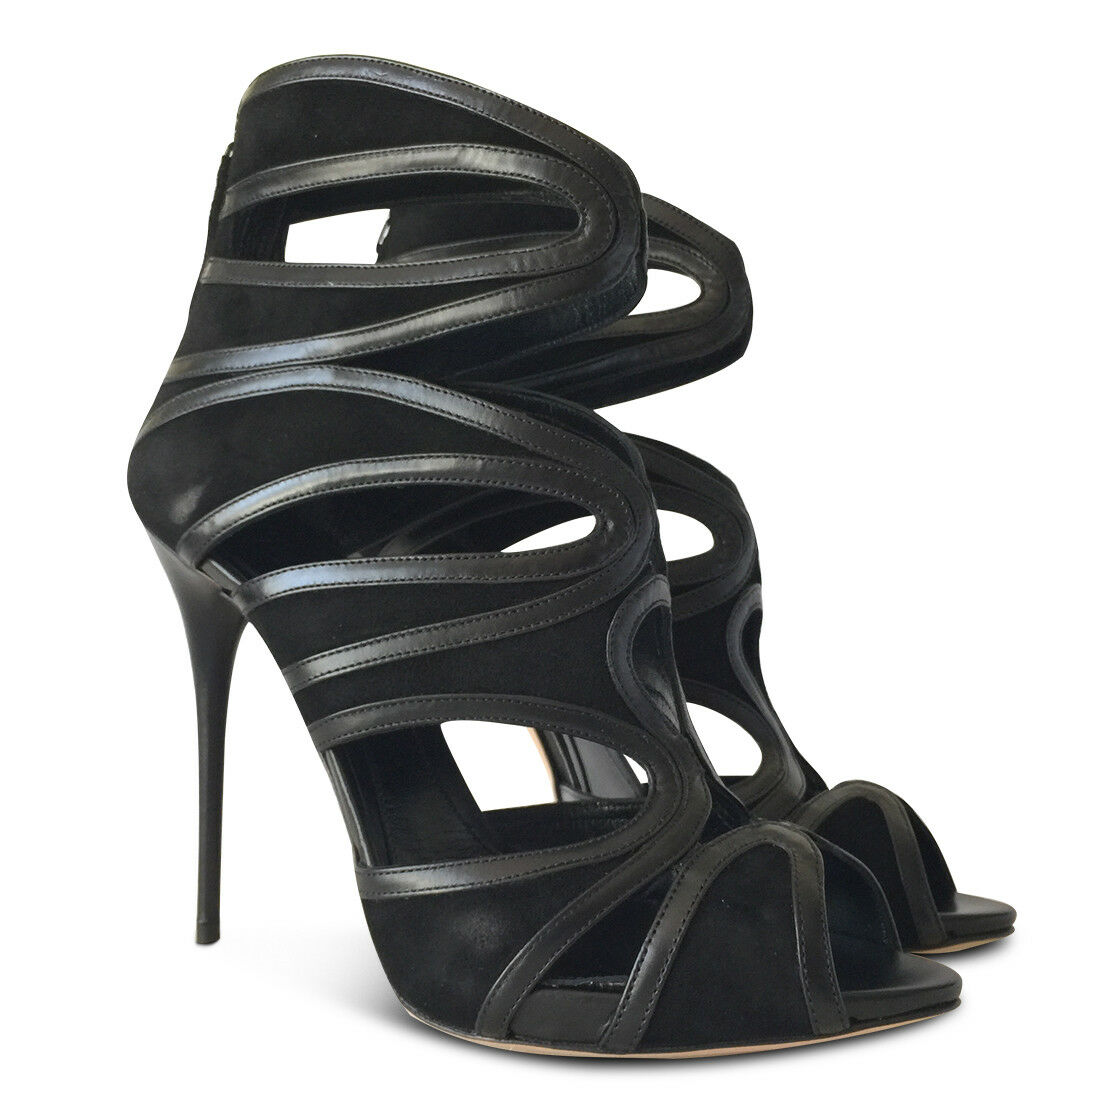 negozio d'offerta NEW ALEXANDER ALEXANDER ALEXANDER MCQUEEN Suede Cutout Sandals - nero - Dimensione 40  promozioni